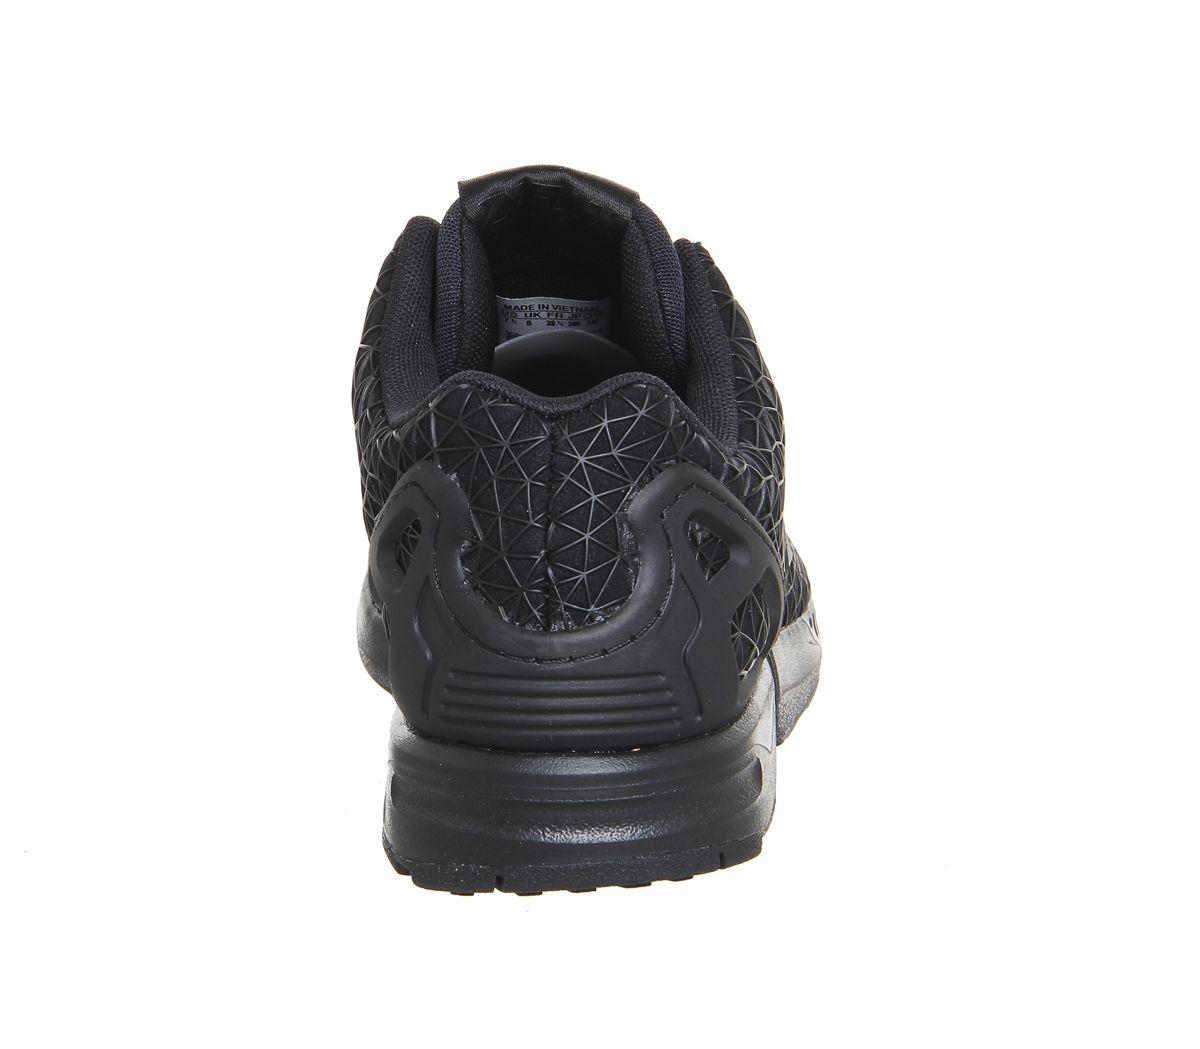 Adidas Zx Flux Core Black Texture W